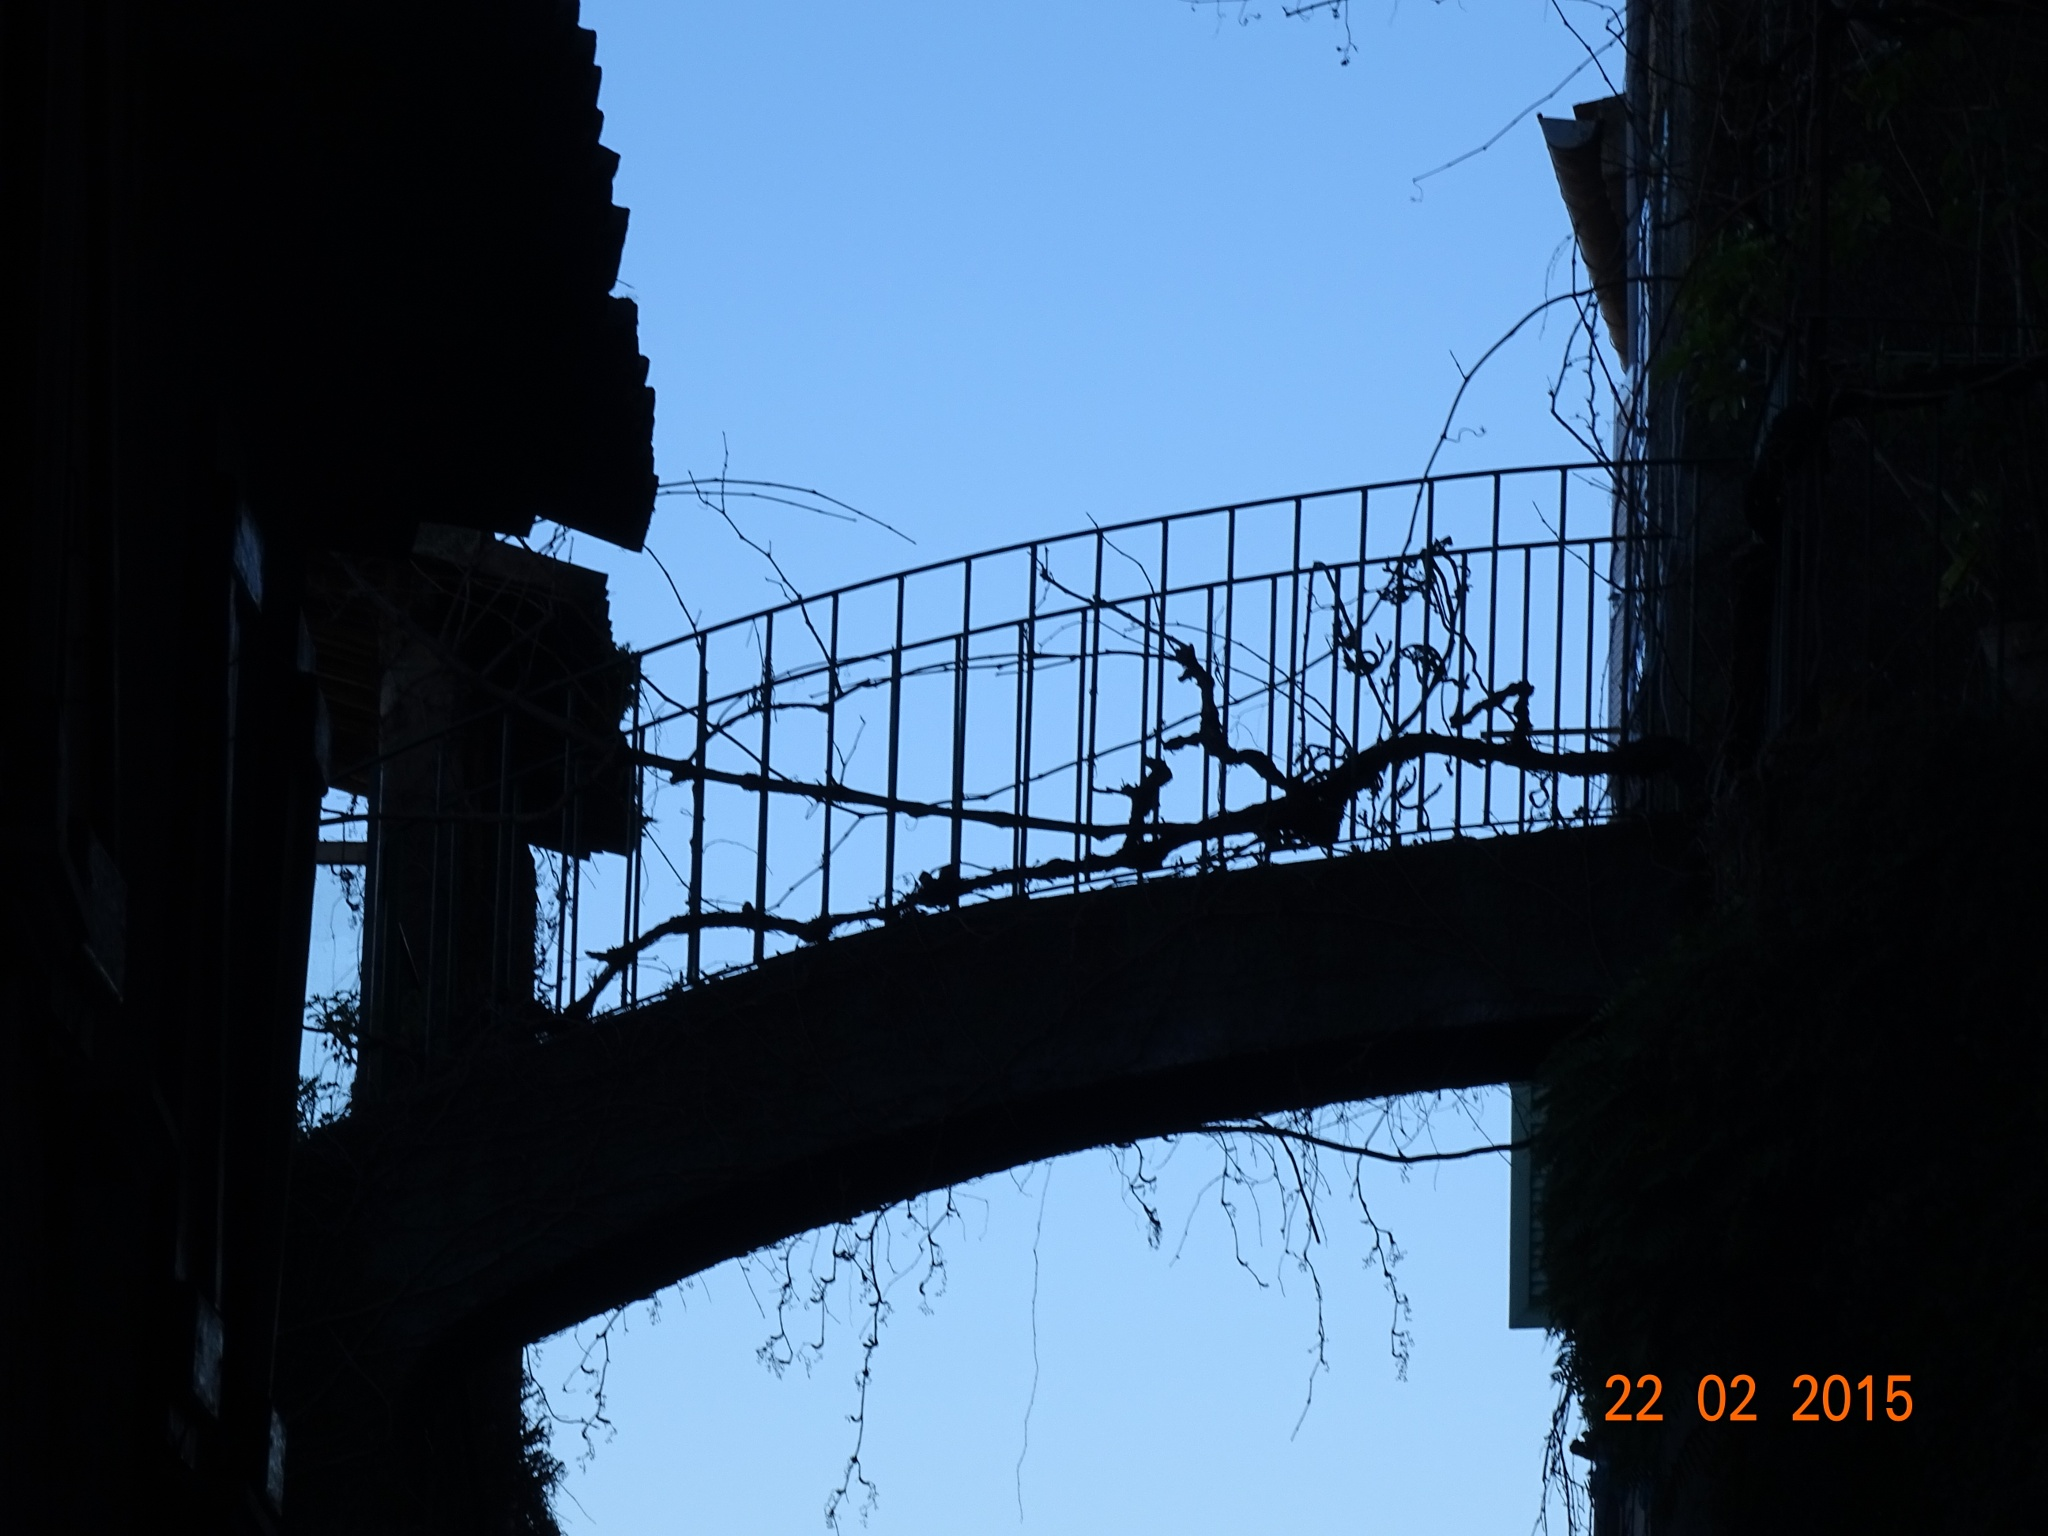 Bridge of Shadows by erol.antz